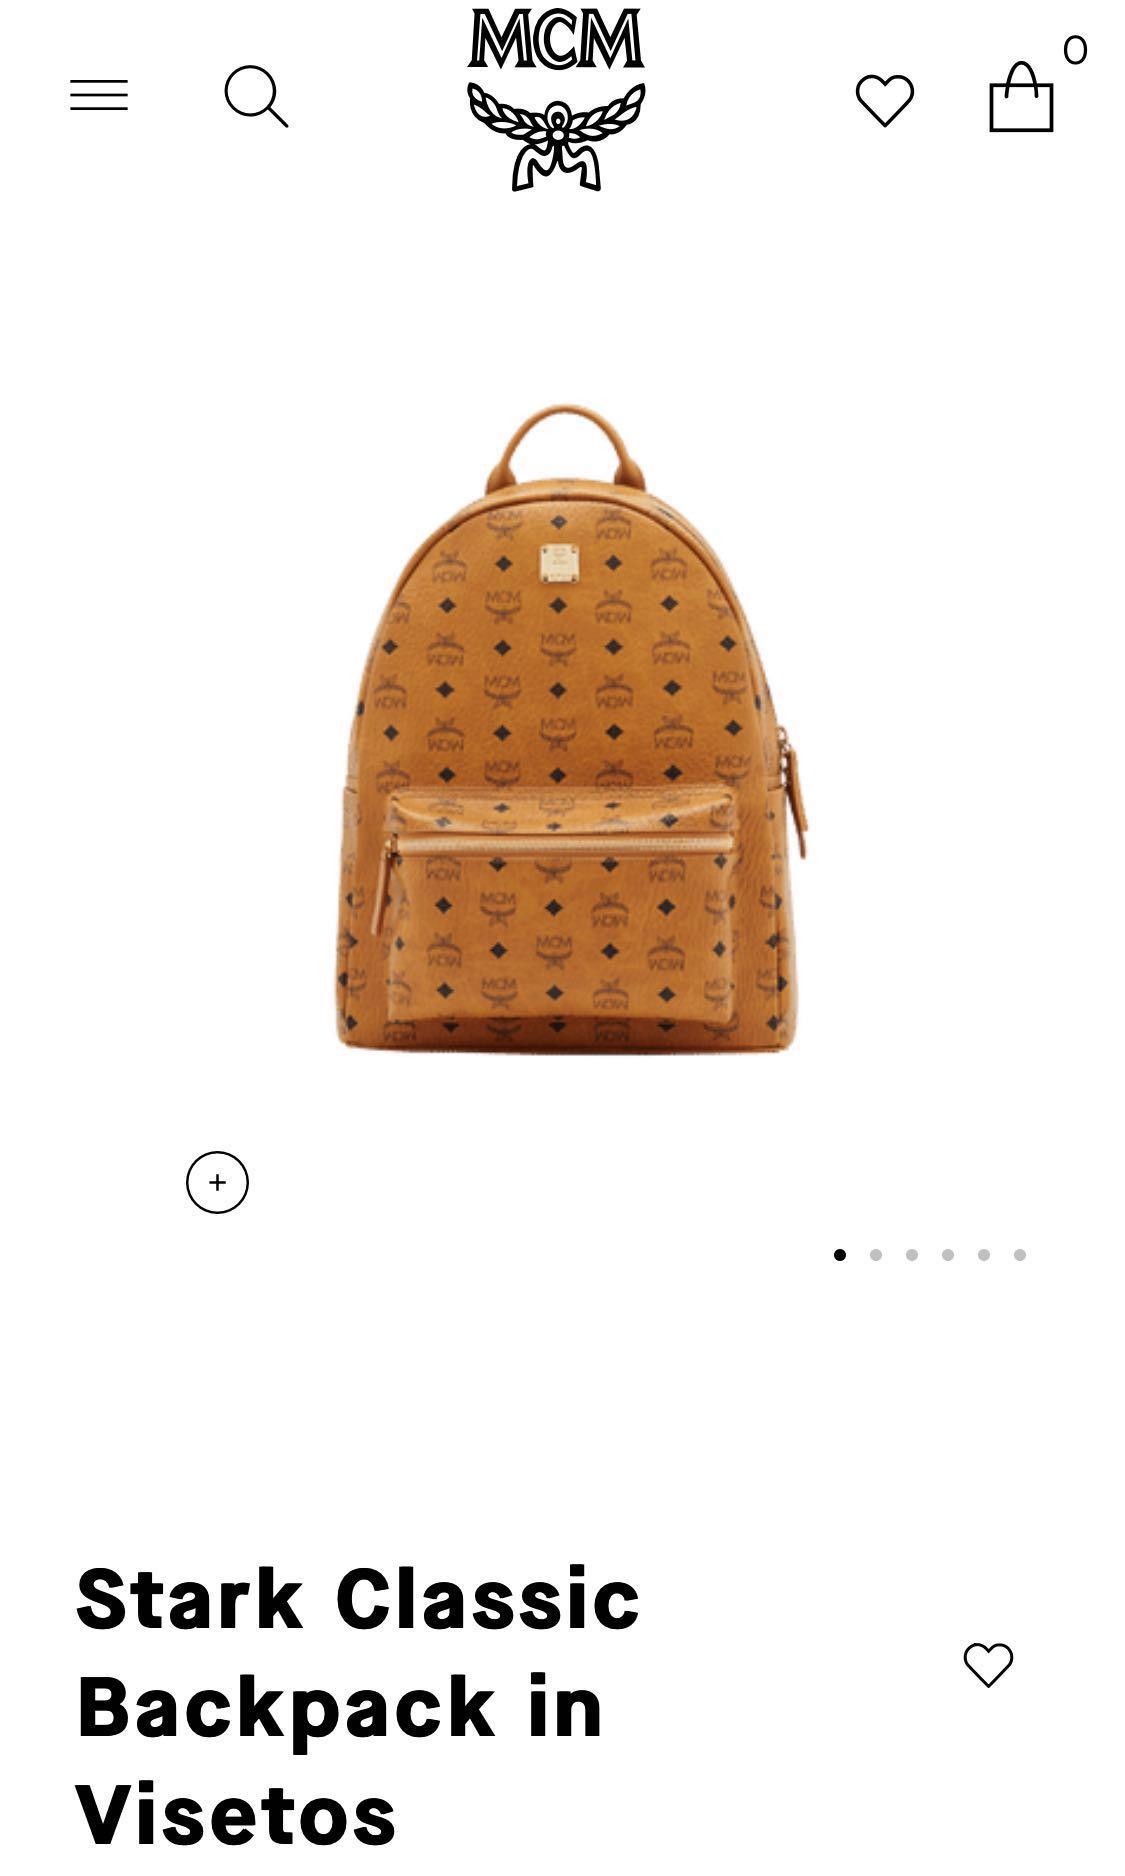 bec5c99a3 MCM Medium Stark Classic Backpack in Visetos, Luxury, Bags & Wallets ...